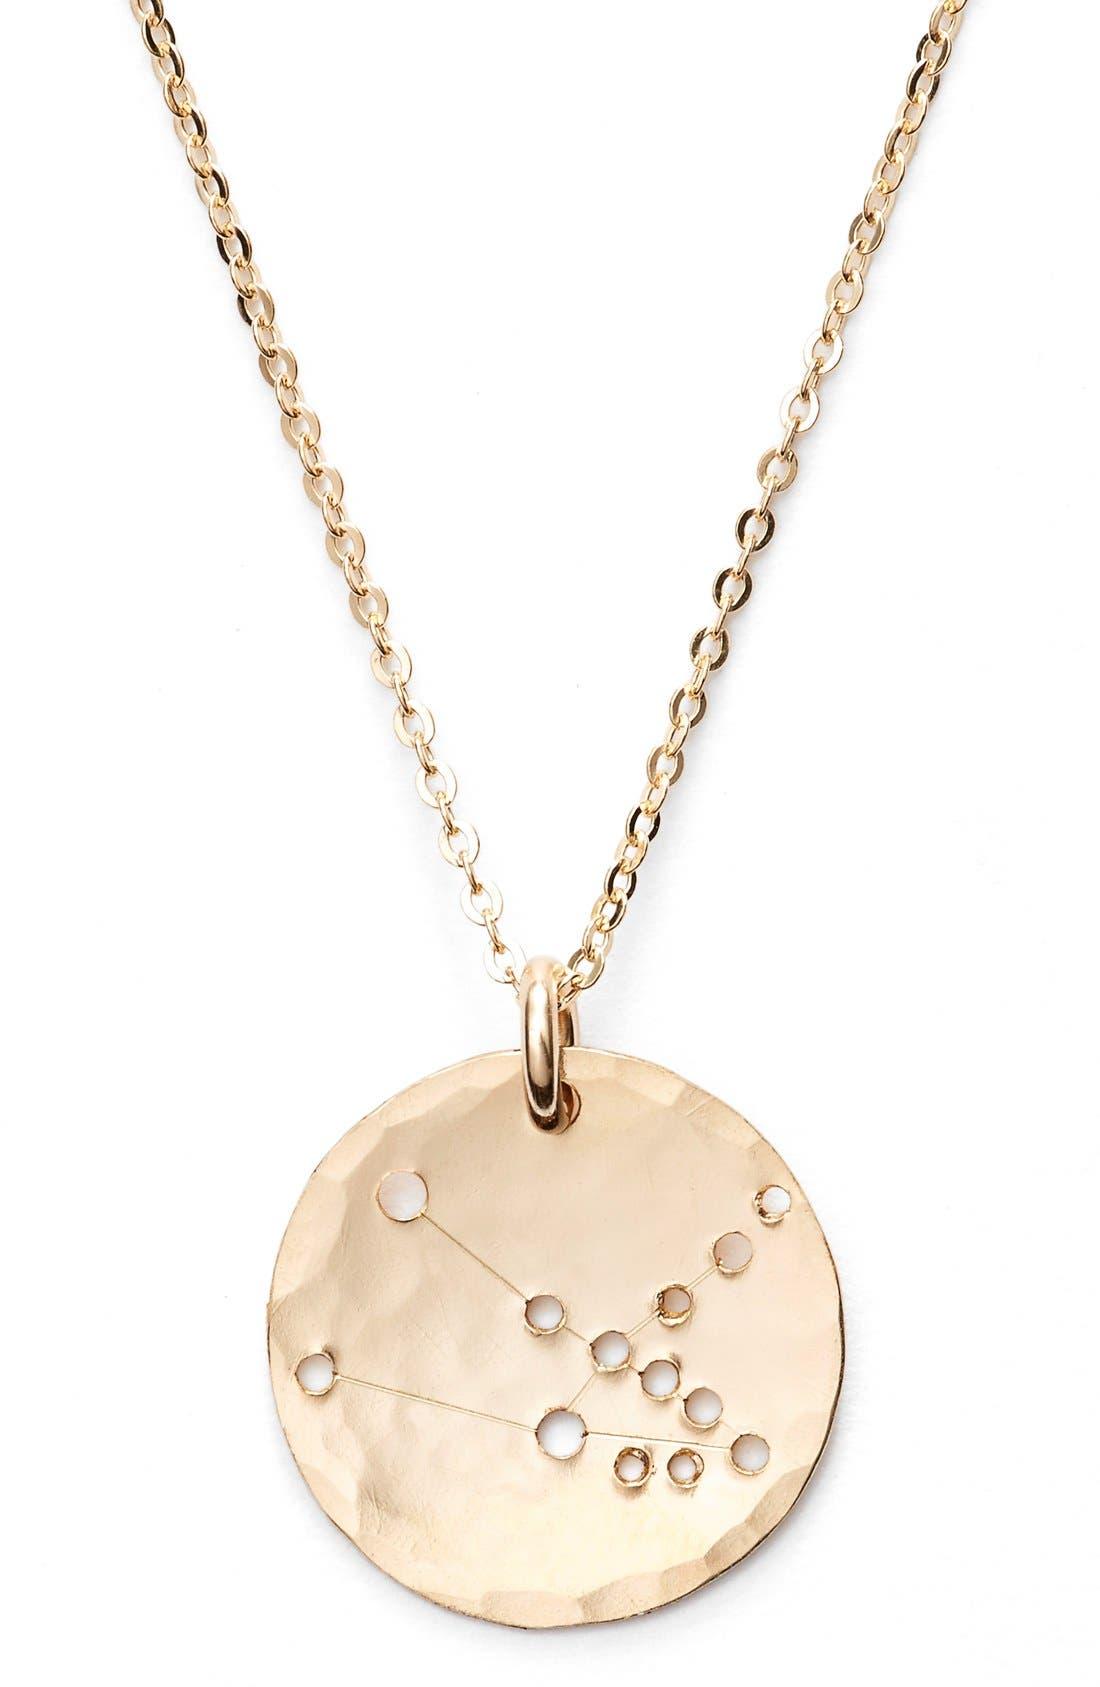 Ija 'Small Zodiac' 14k-Gold Fill Necklace,                             Alternate thumbnail 14, color,